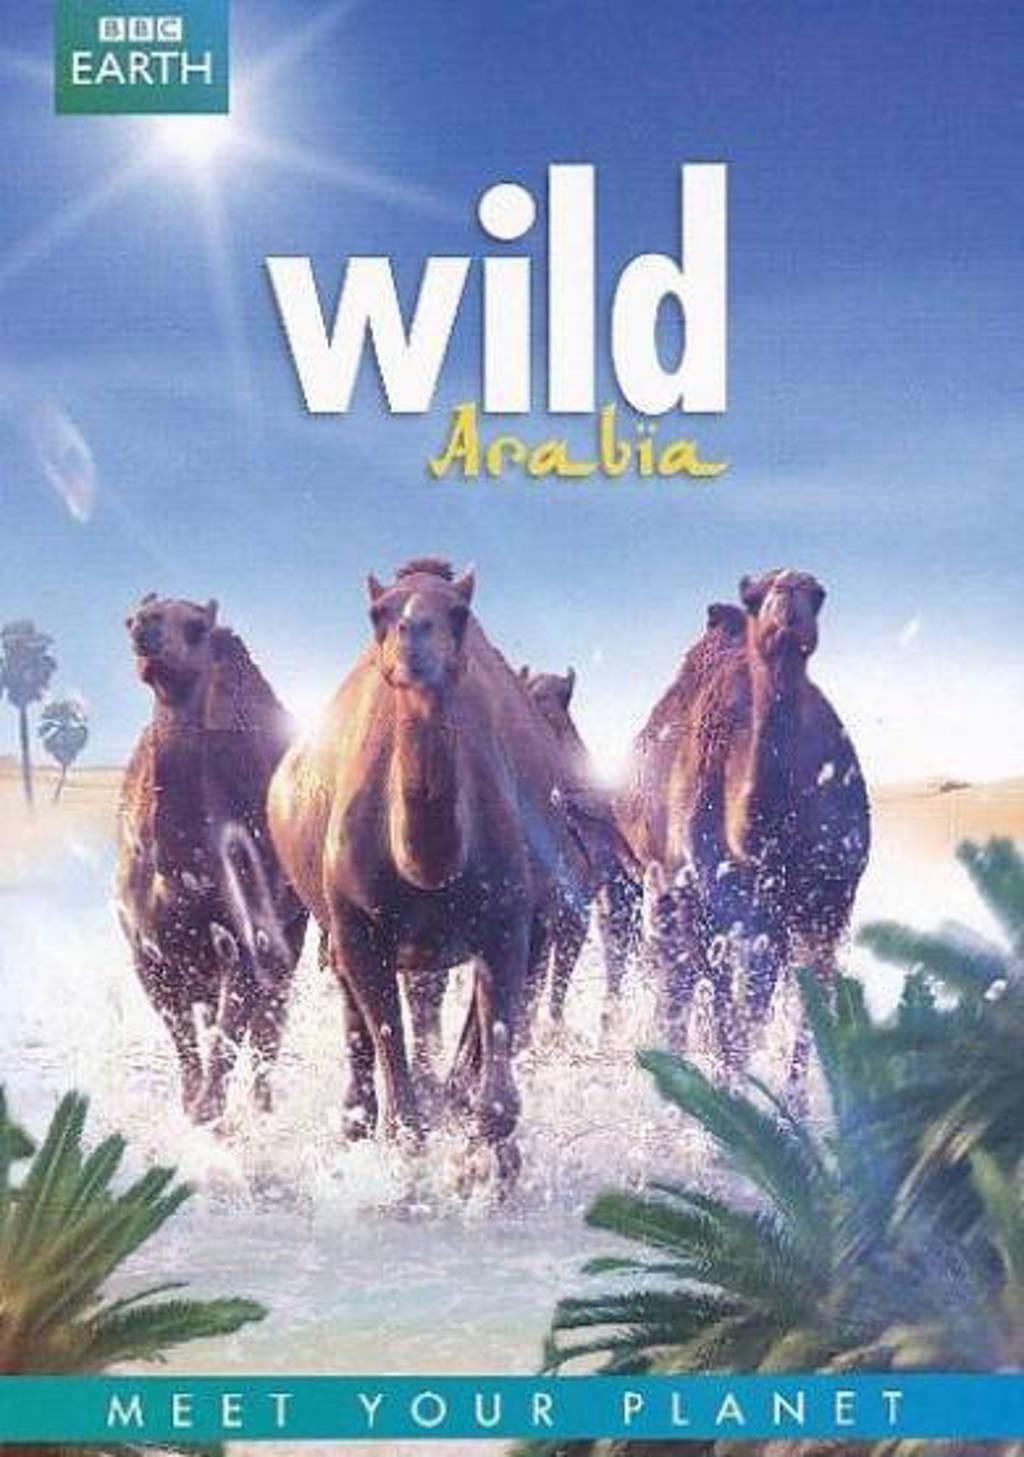 BBC earth - Wild Arabia (DVD)